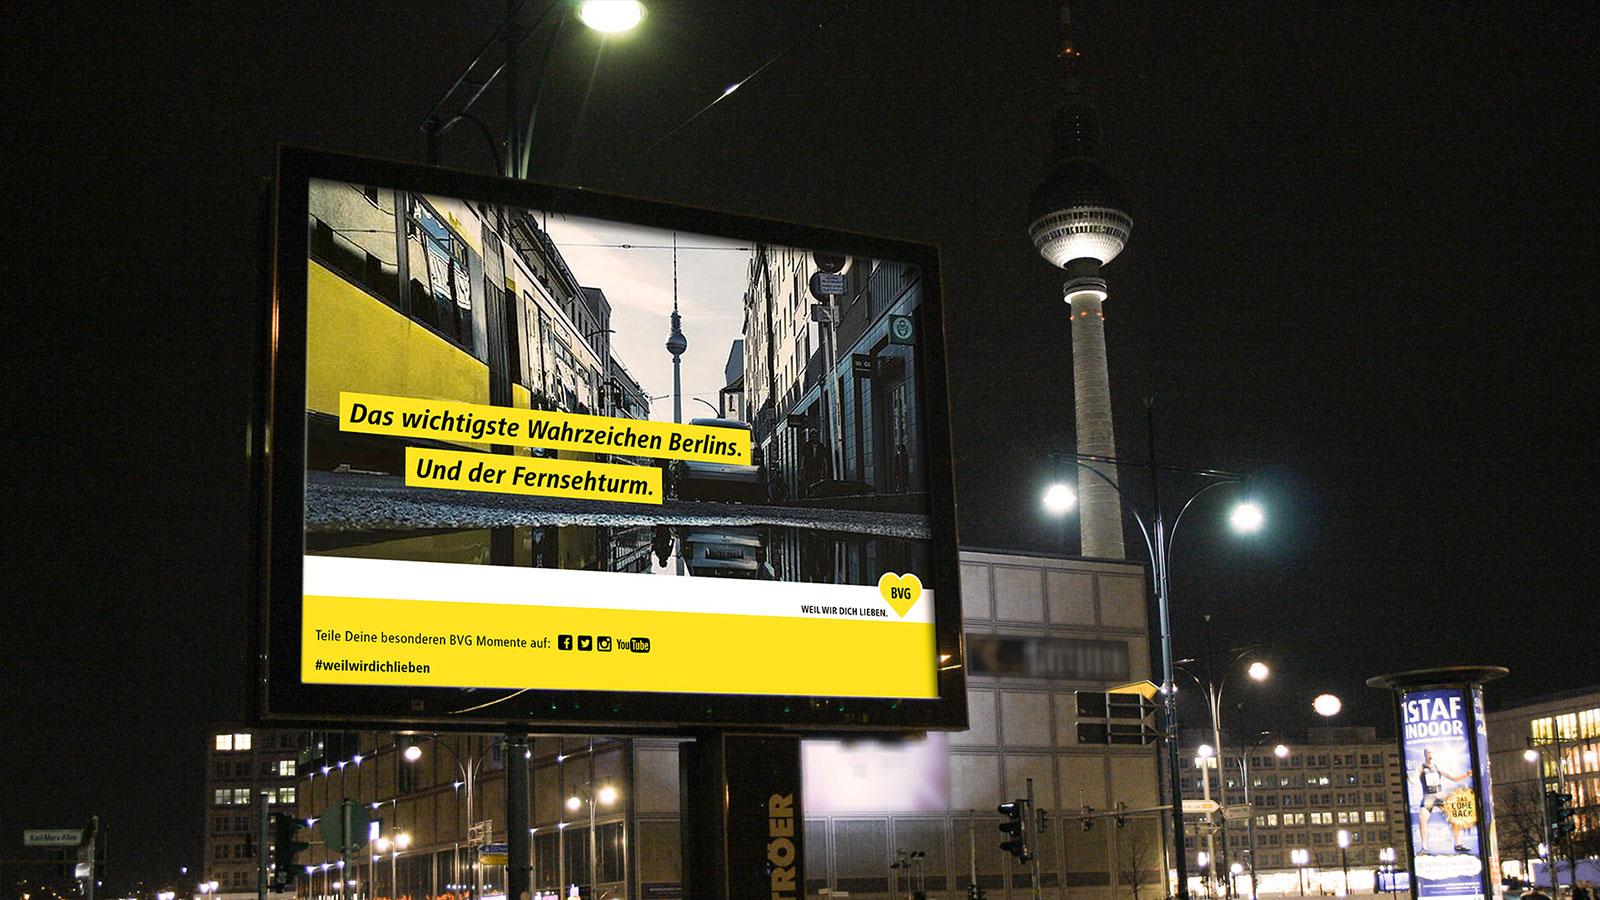 BVG_Fernsehturm_Tram_OOH_Megalight_1600x900px